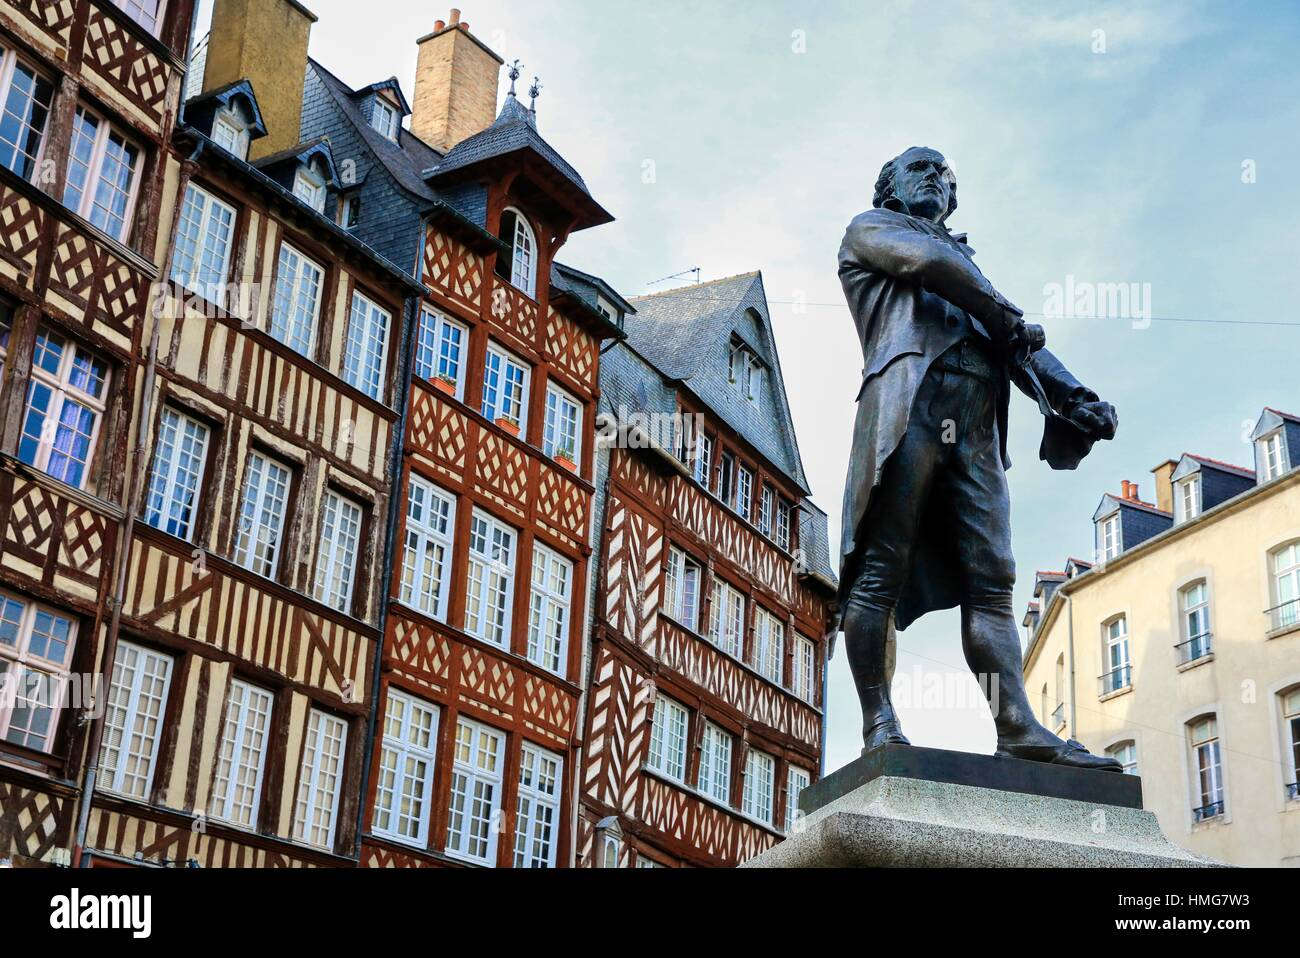 Leperdit statue, Champ-Jacquet square, Rennes, Bretagne, Brittany, France - Stock Image